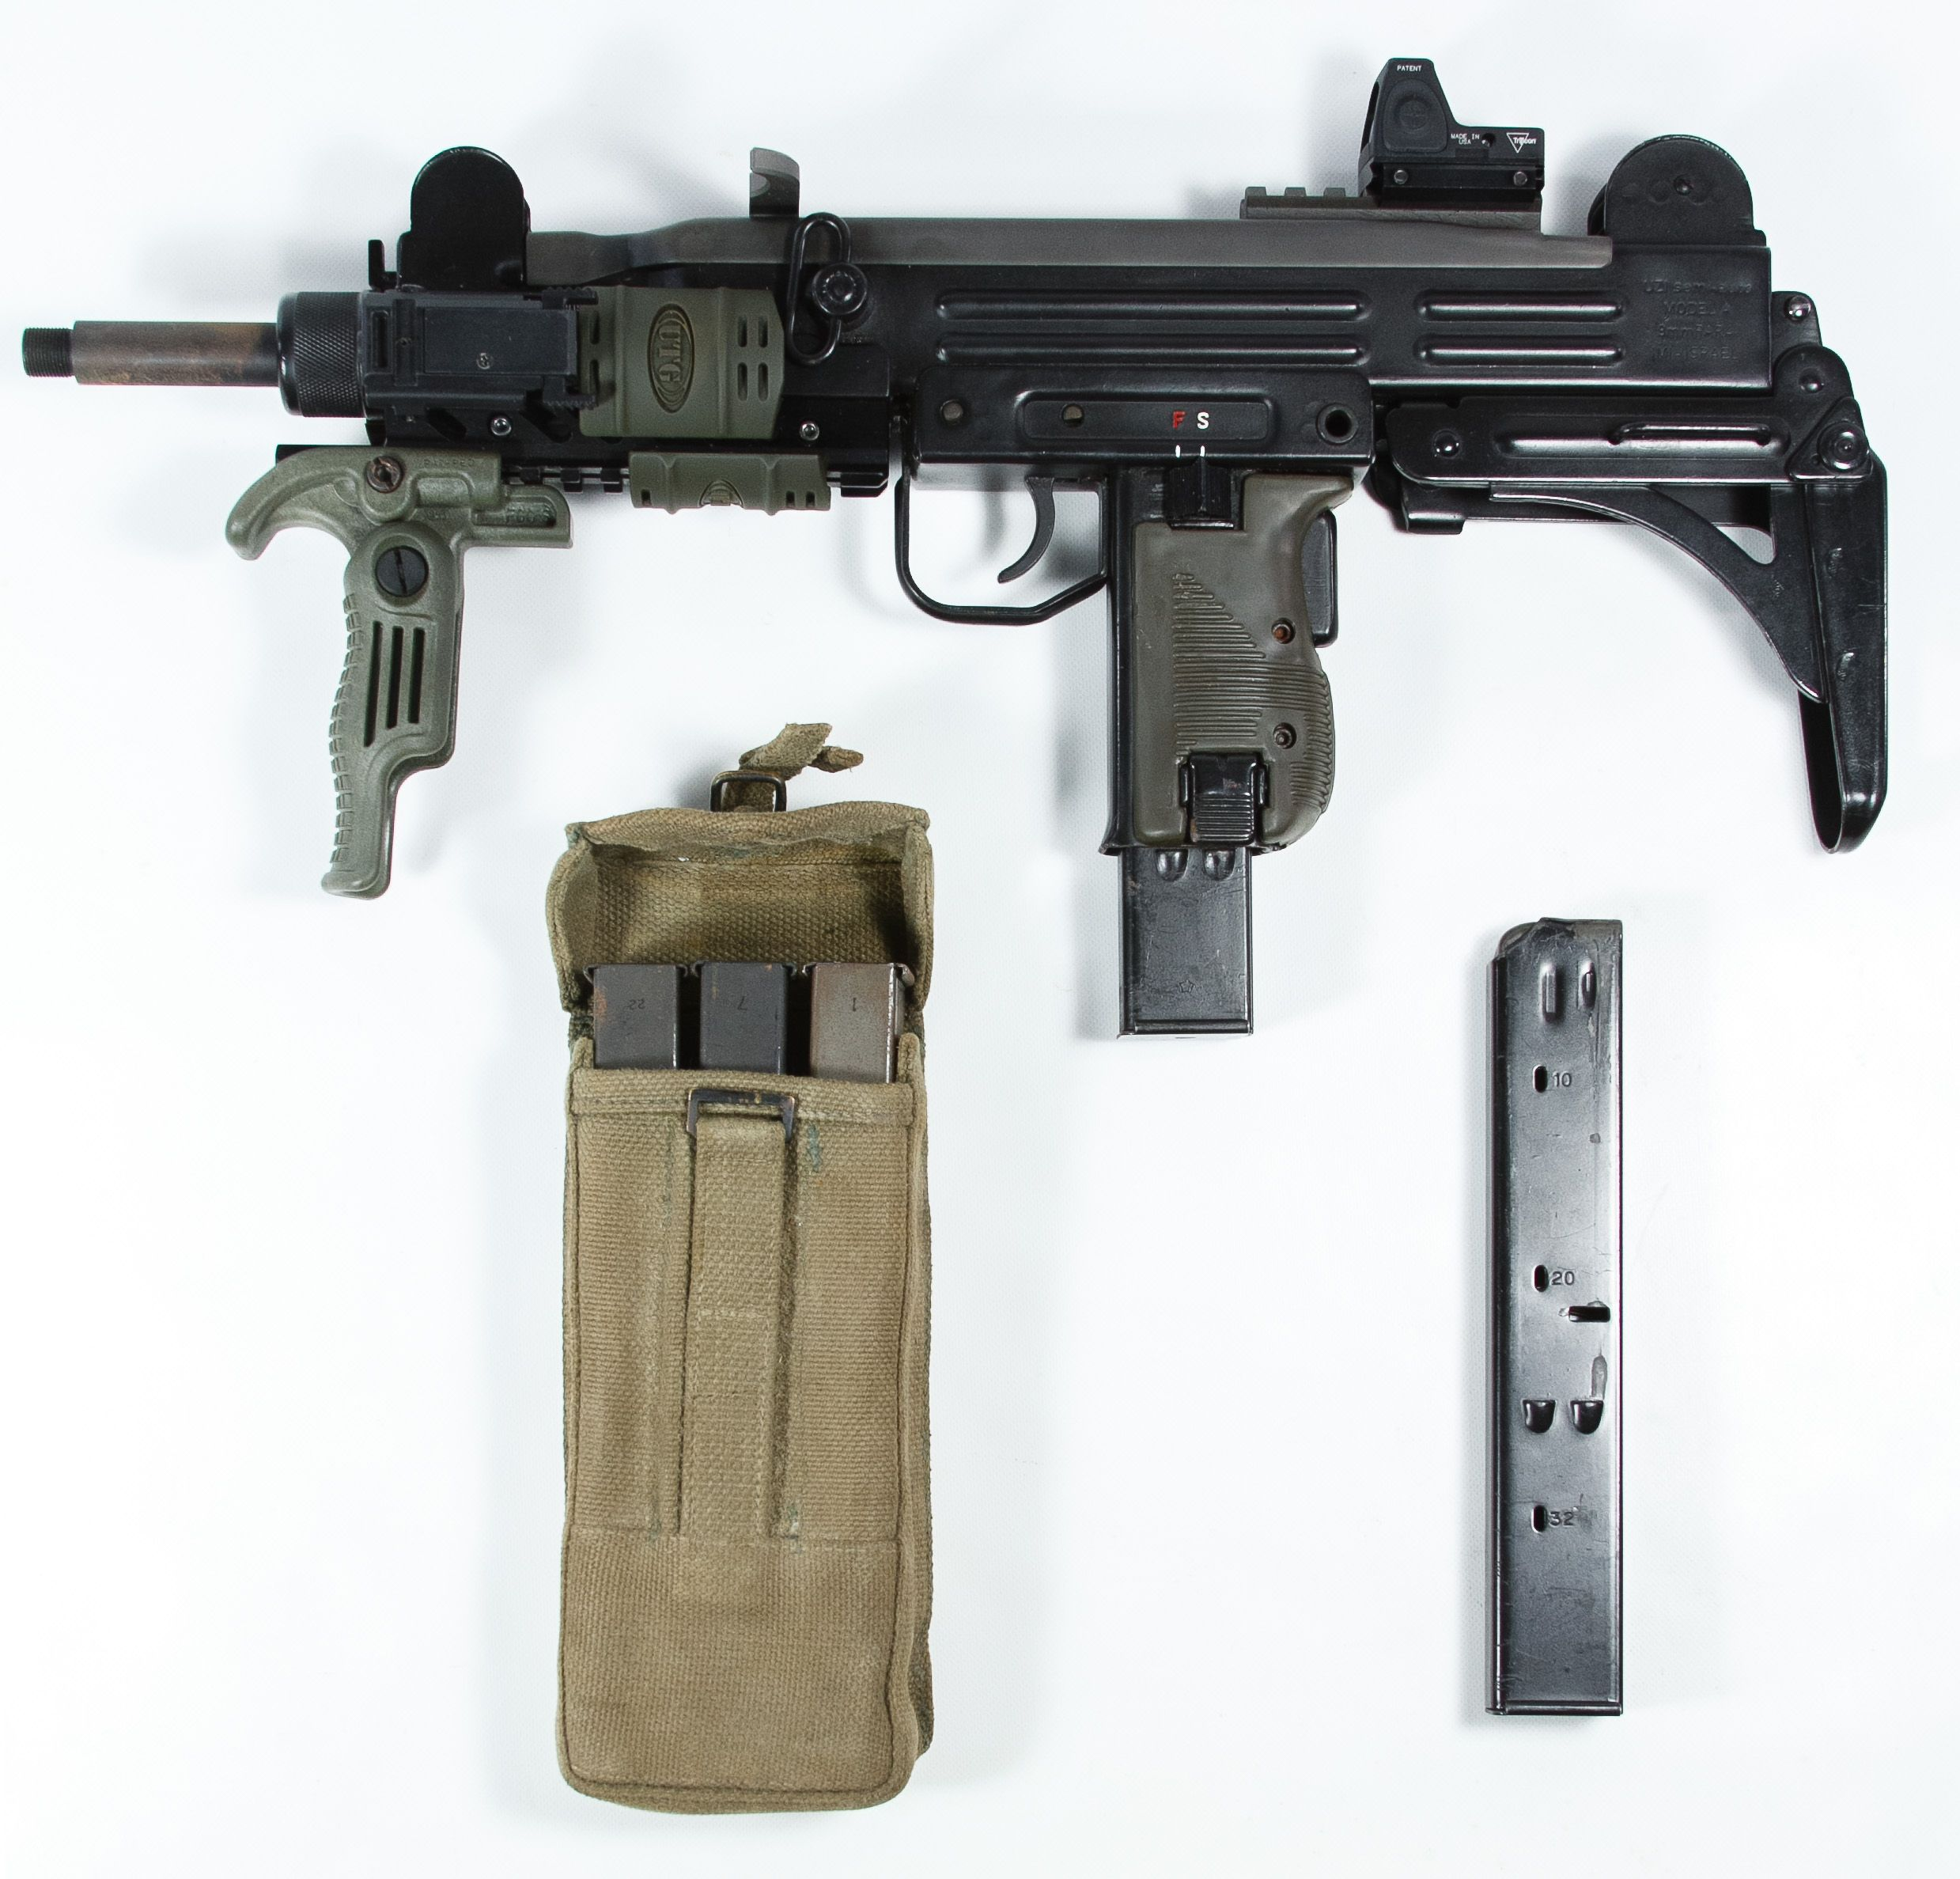 Lot 263: Action Arms UZI Model A 9mm Semi-Automatic Carbine